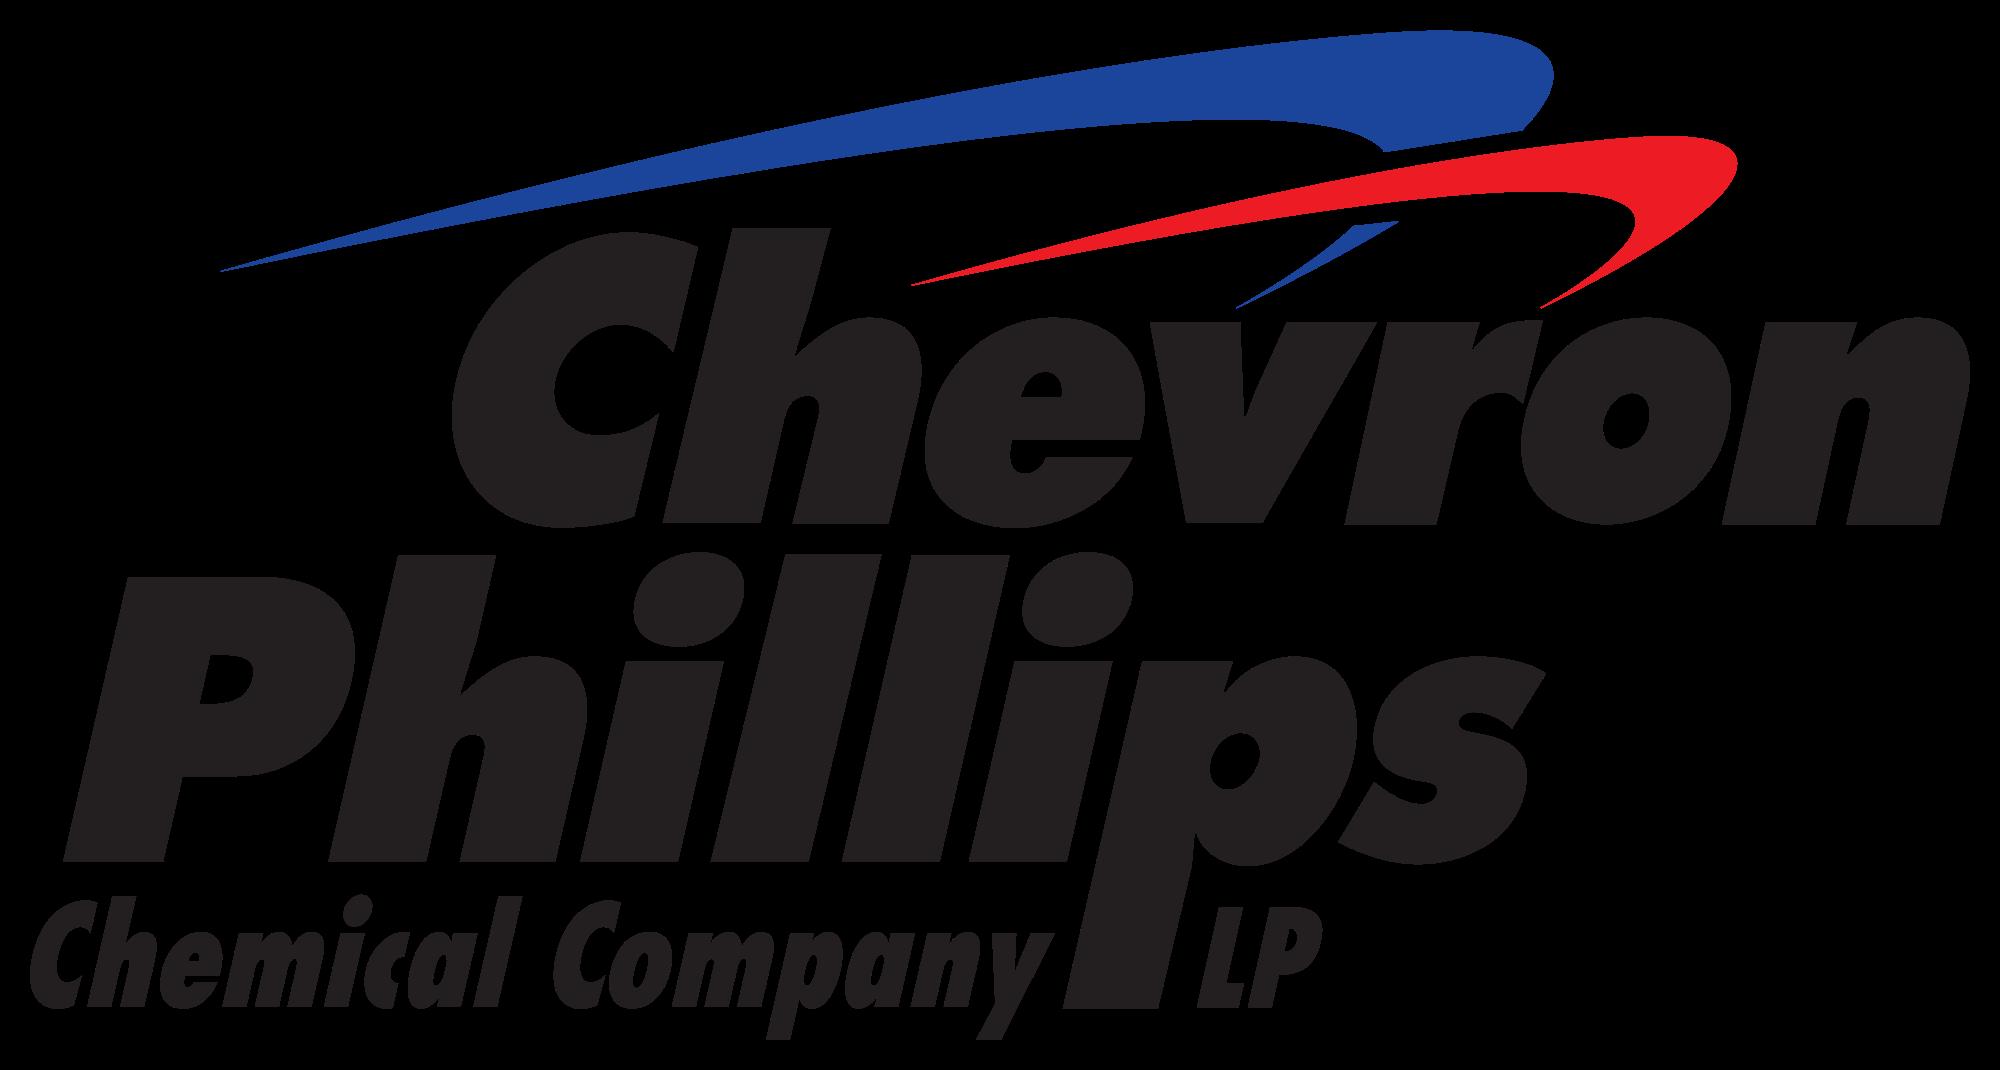 Chevron Phillips Logo.png